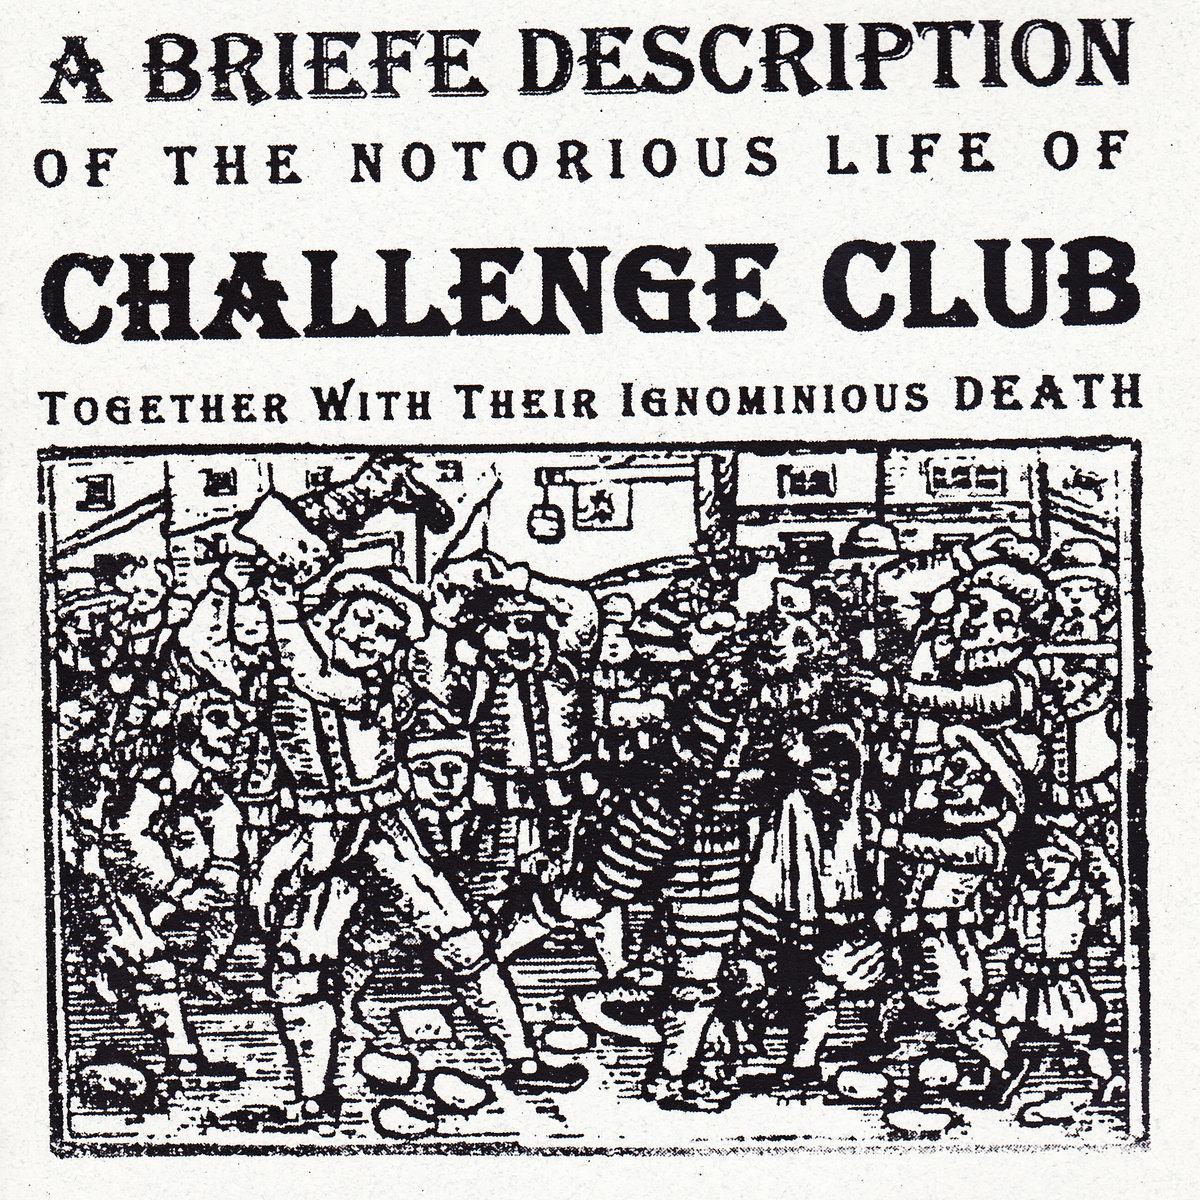 CHALLENGE CLUB - CHALLENGE CLUB